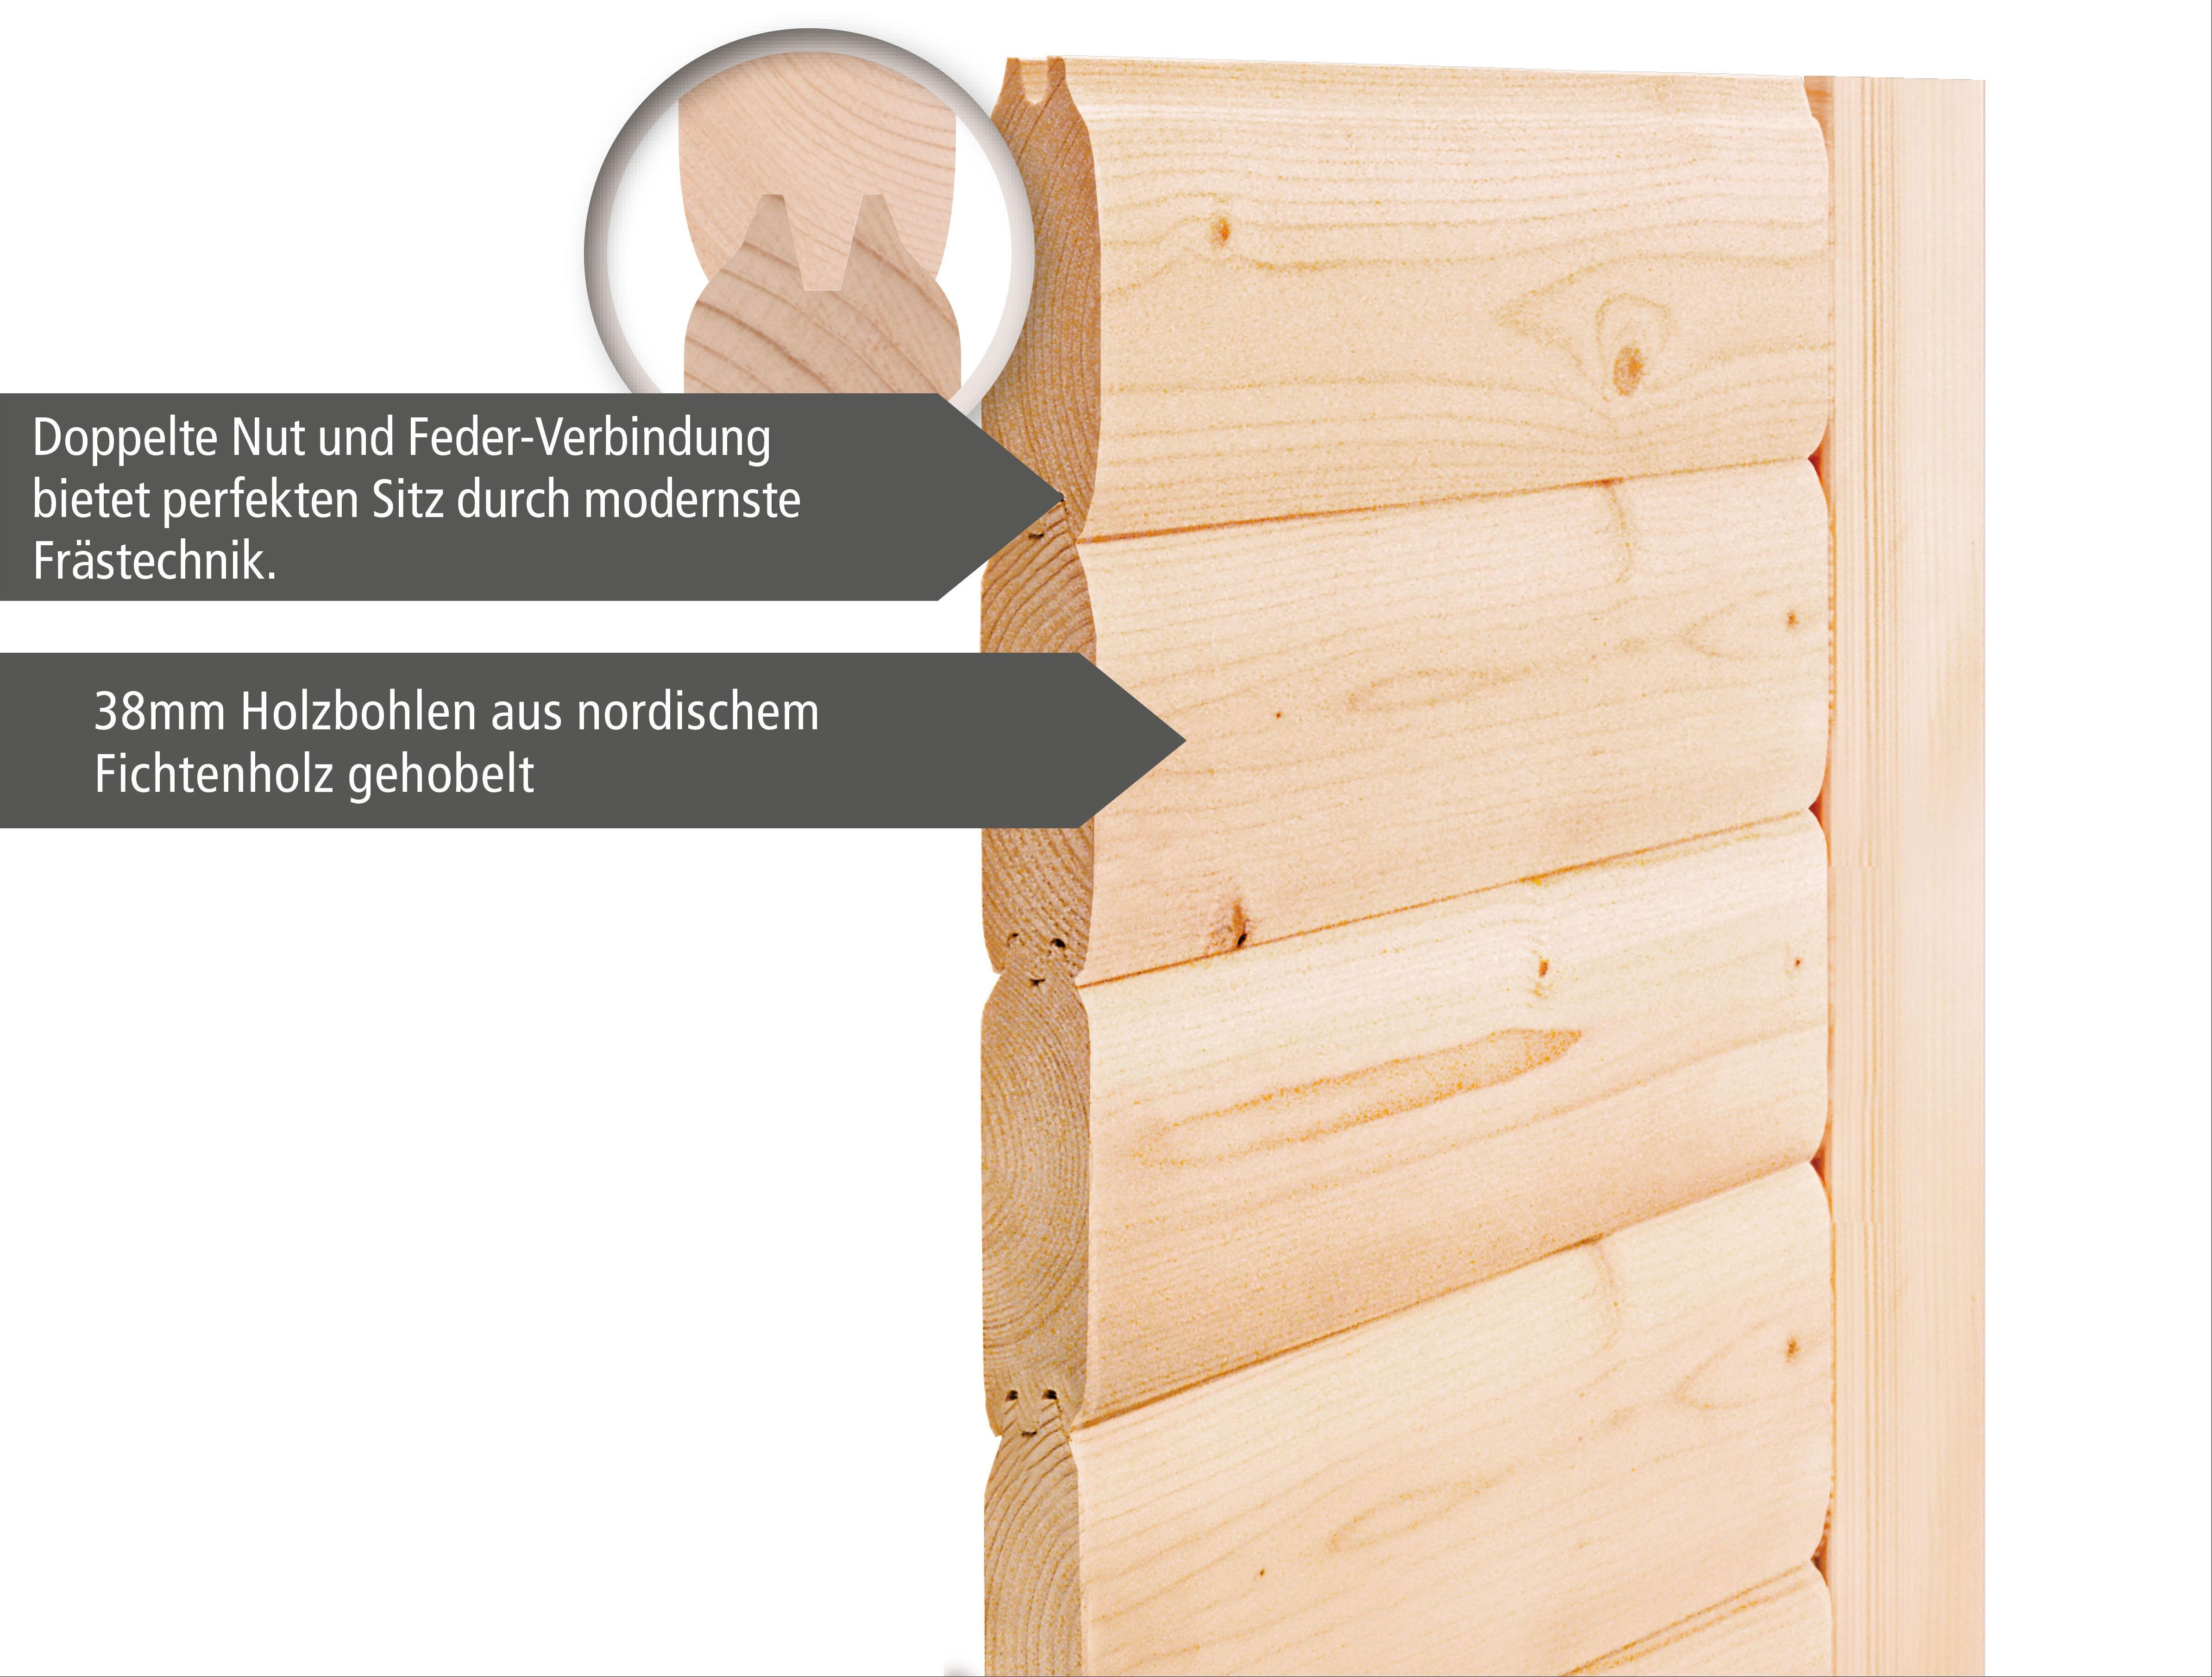 WoodFeeling Sauna Anja 38mm Saunaofen 9kW intern Kranz Holztür Bild 5